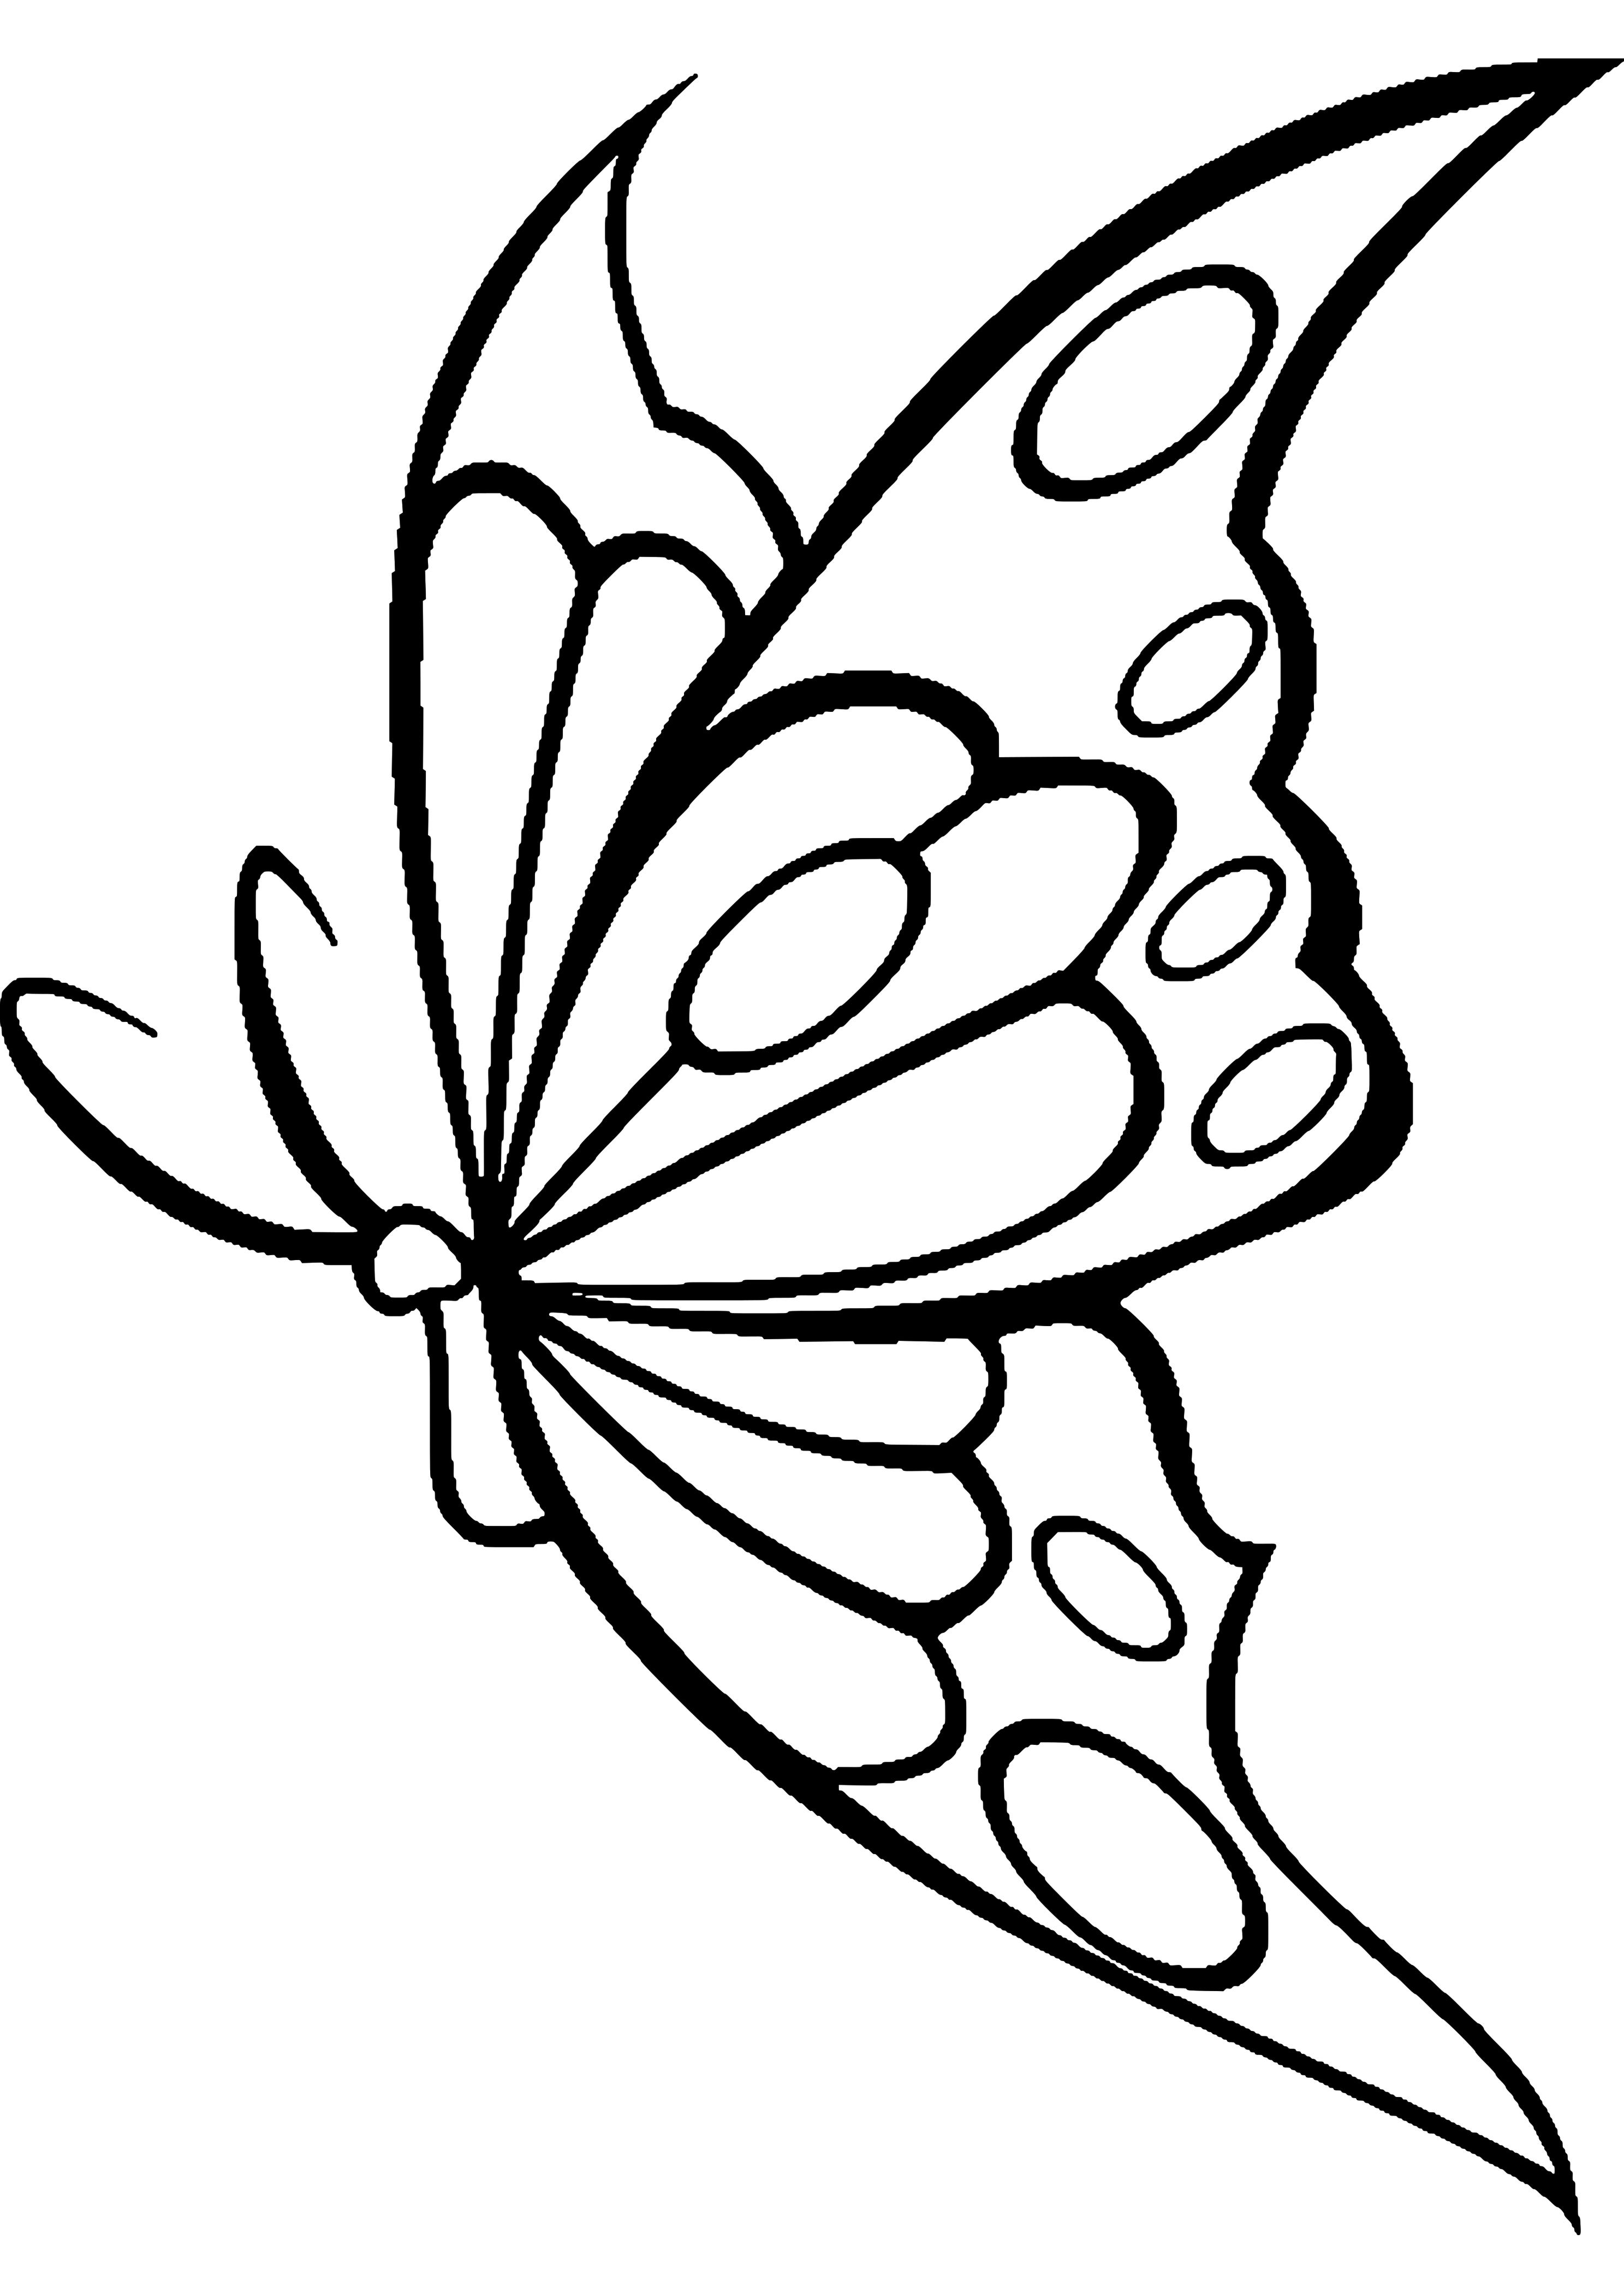 Mariposas para Colorear o Dibujar